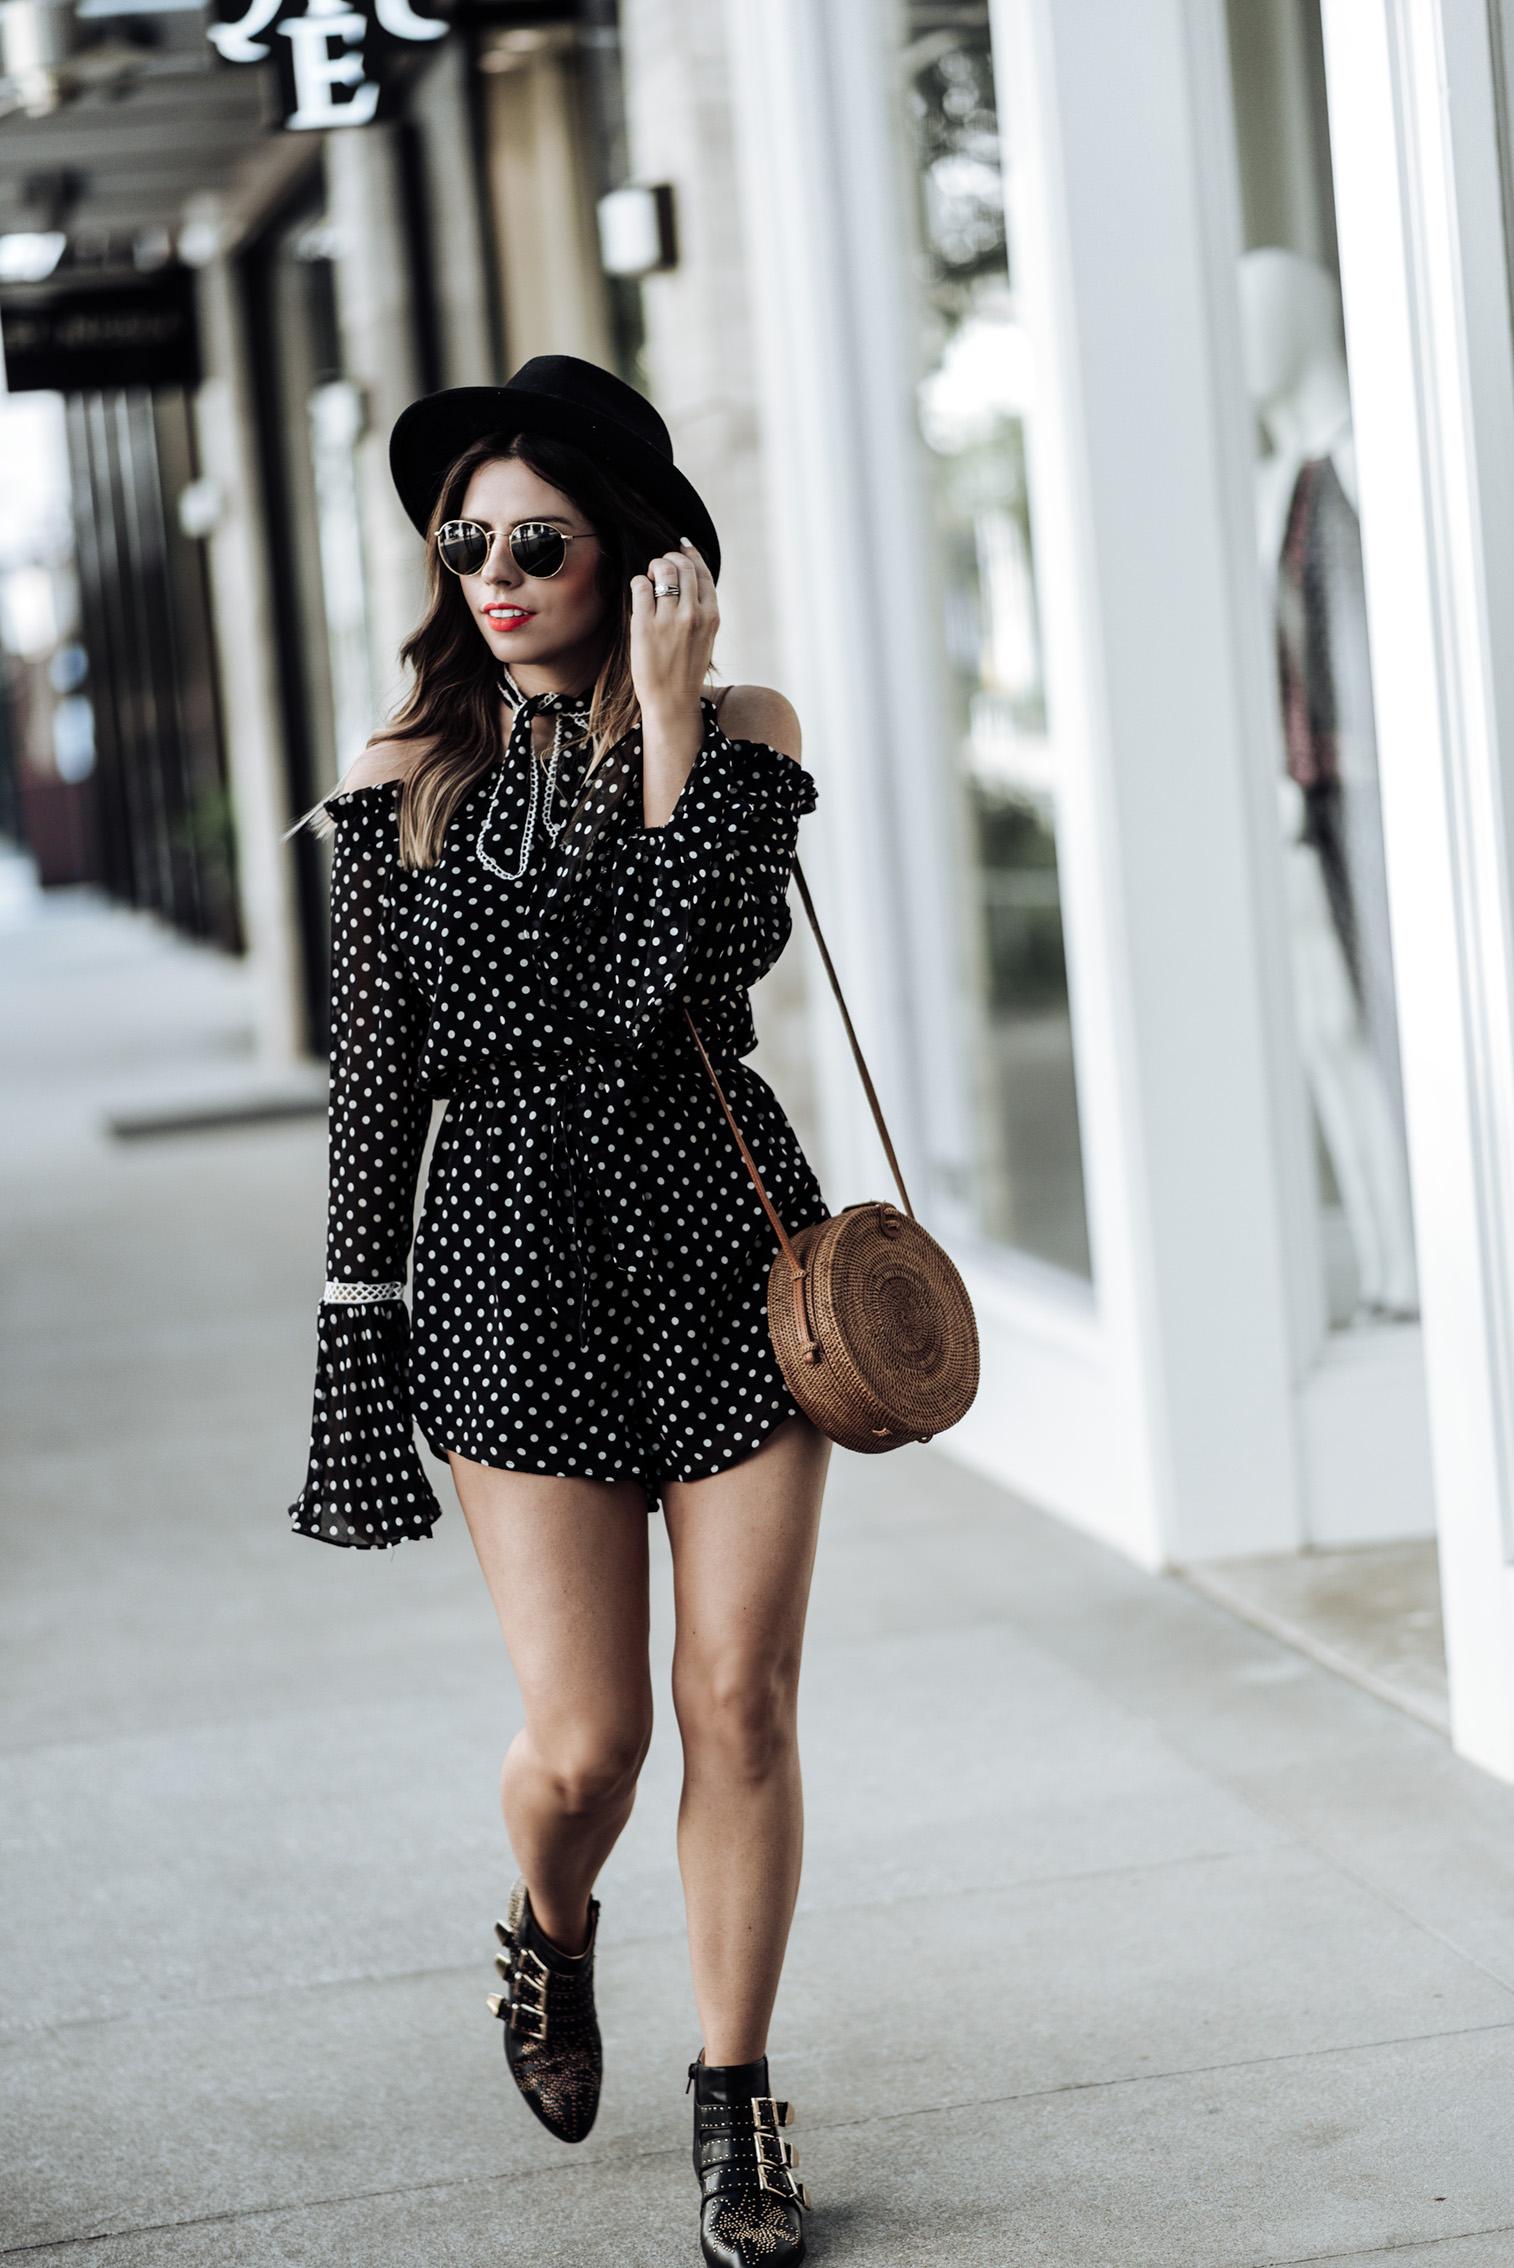 Tiffany Jais Houston fashion and lifestyle blogger   polka dot romper   round rattan bag, chloe studded boots, brixton hat , street style looks